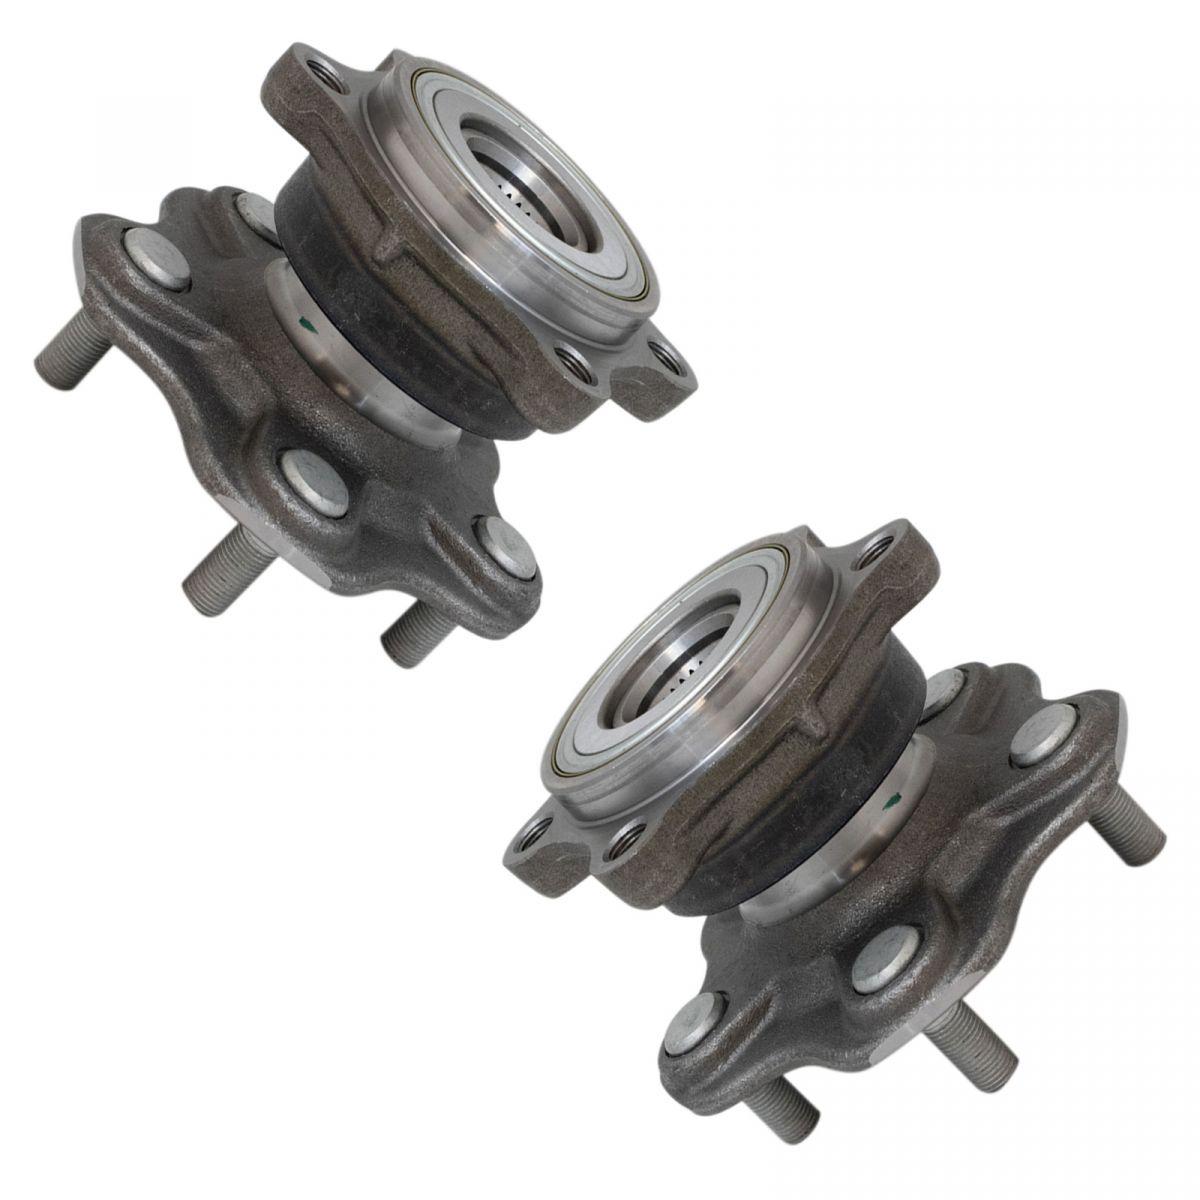 DRIVESTAR 512346x2 Pair//Set:2 Rear Wheel Hub /& Bearing Assembly for Nissan 350Z Infiniti G35